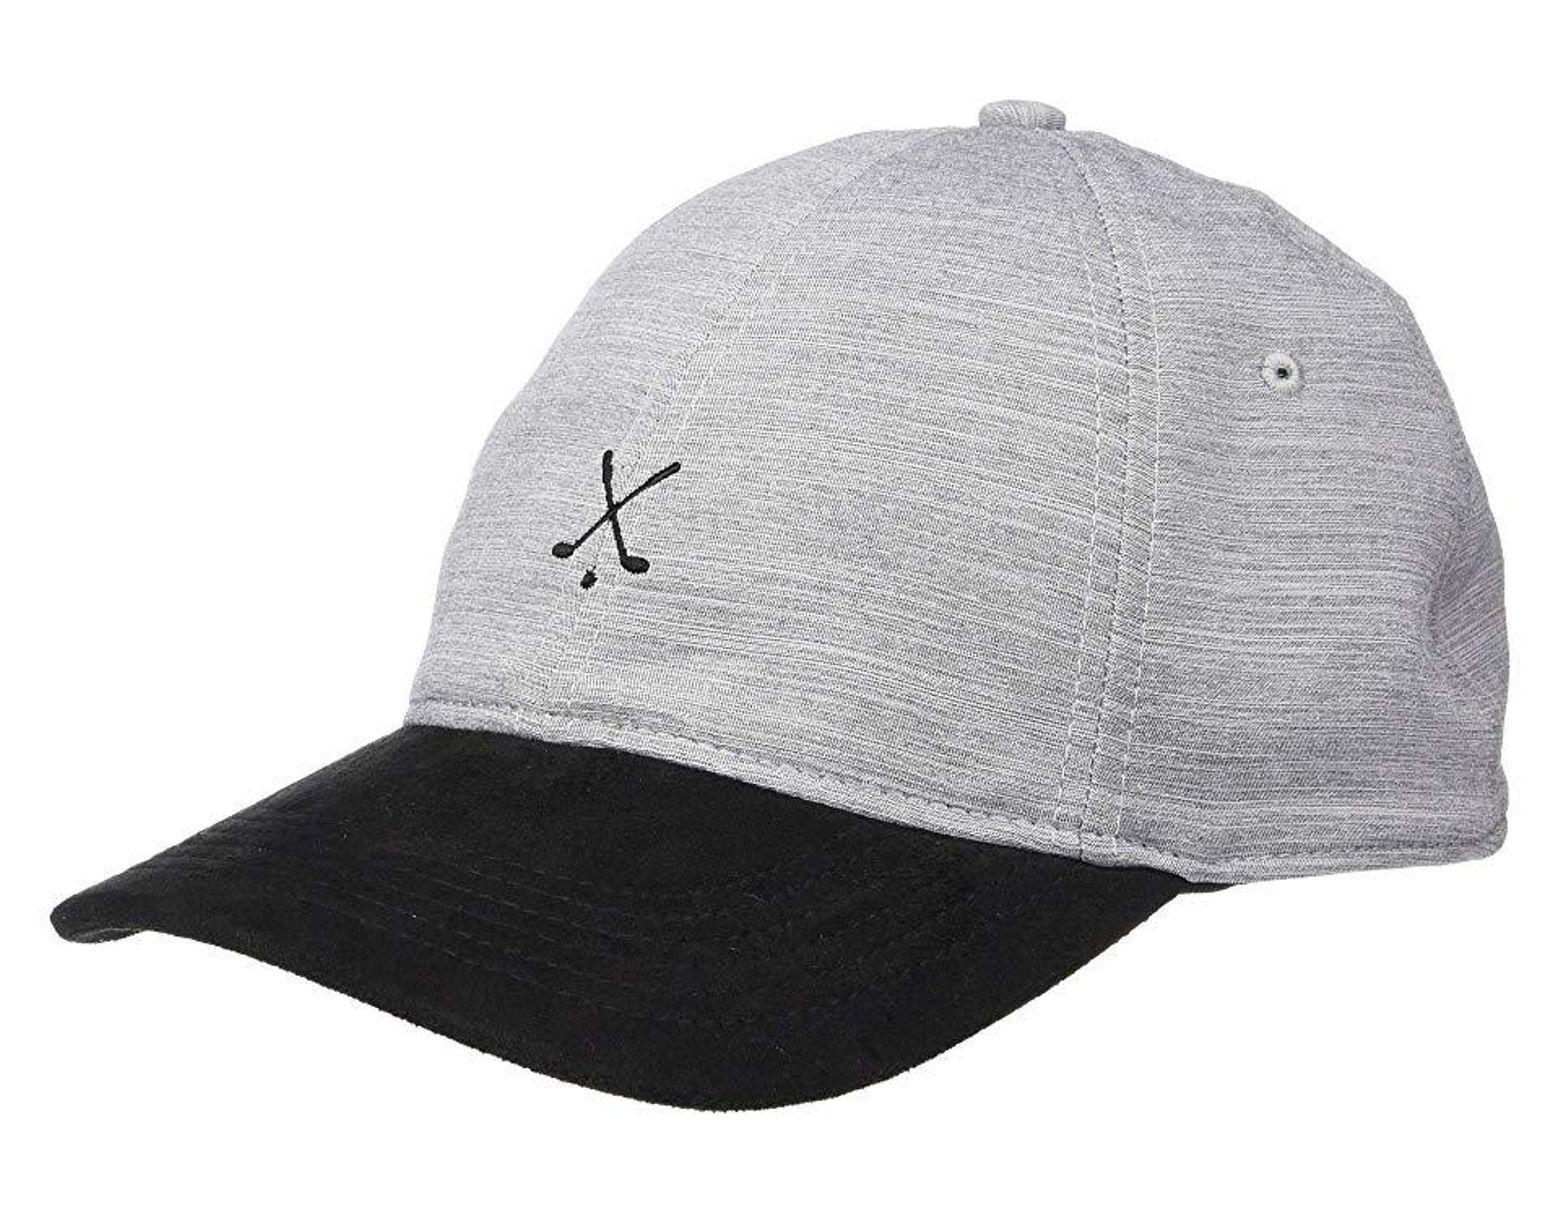 79186f999 Nike Aerobill Legacy 91 Hat (carbon Heather/black/black) Caps in ...